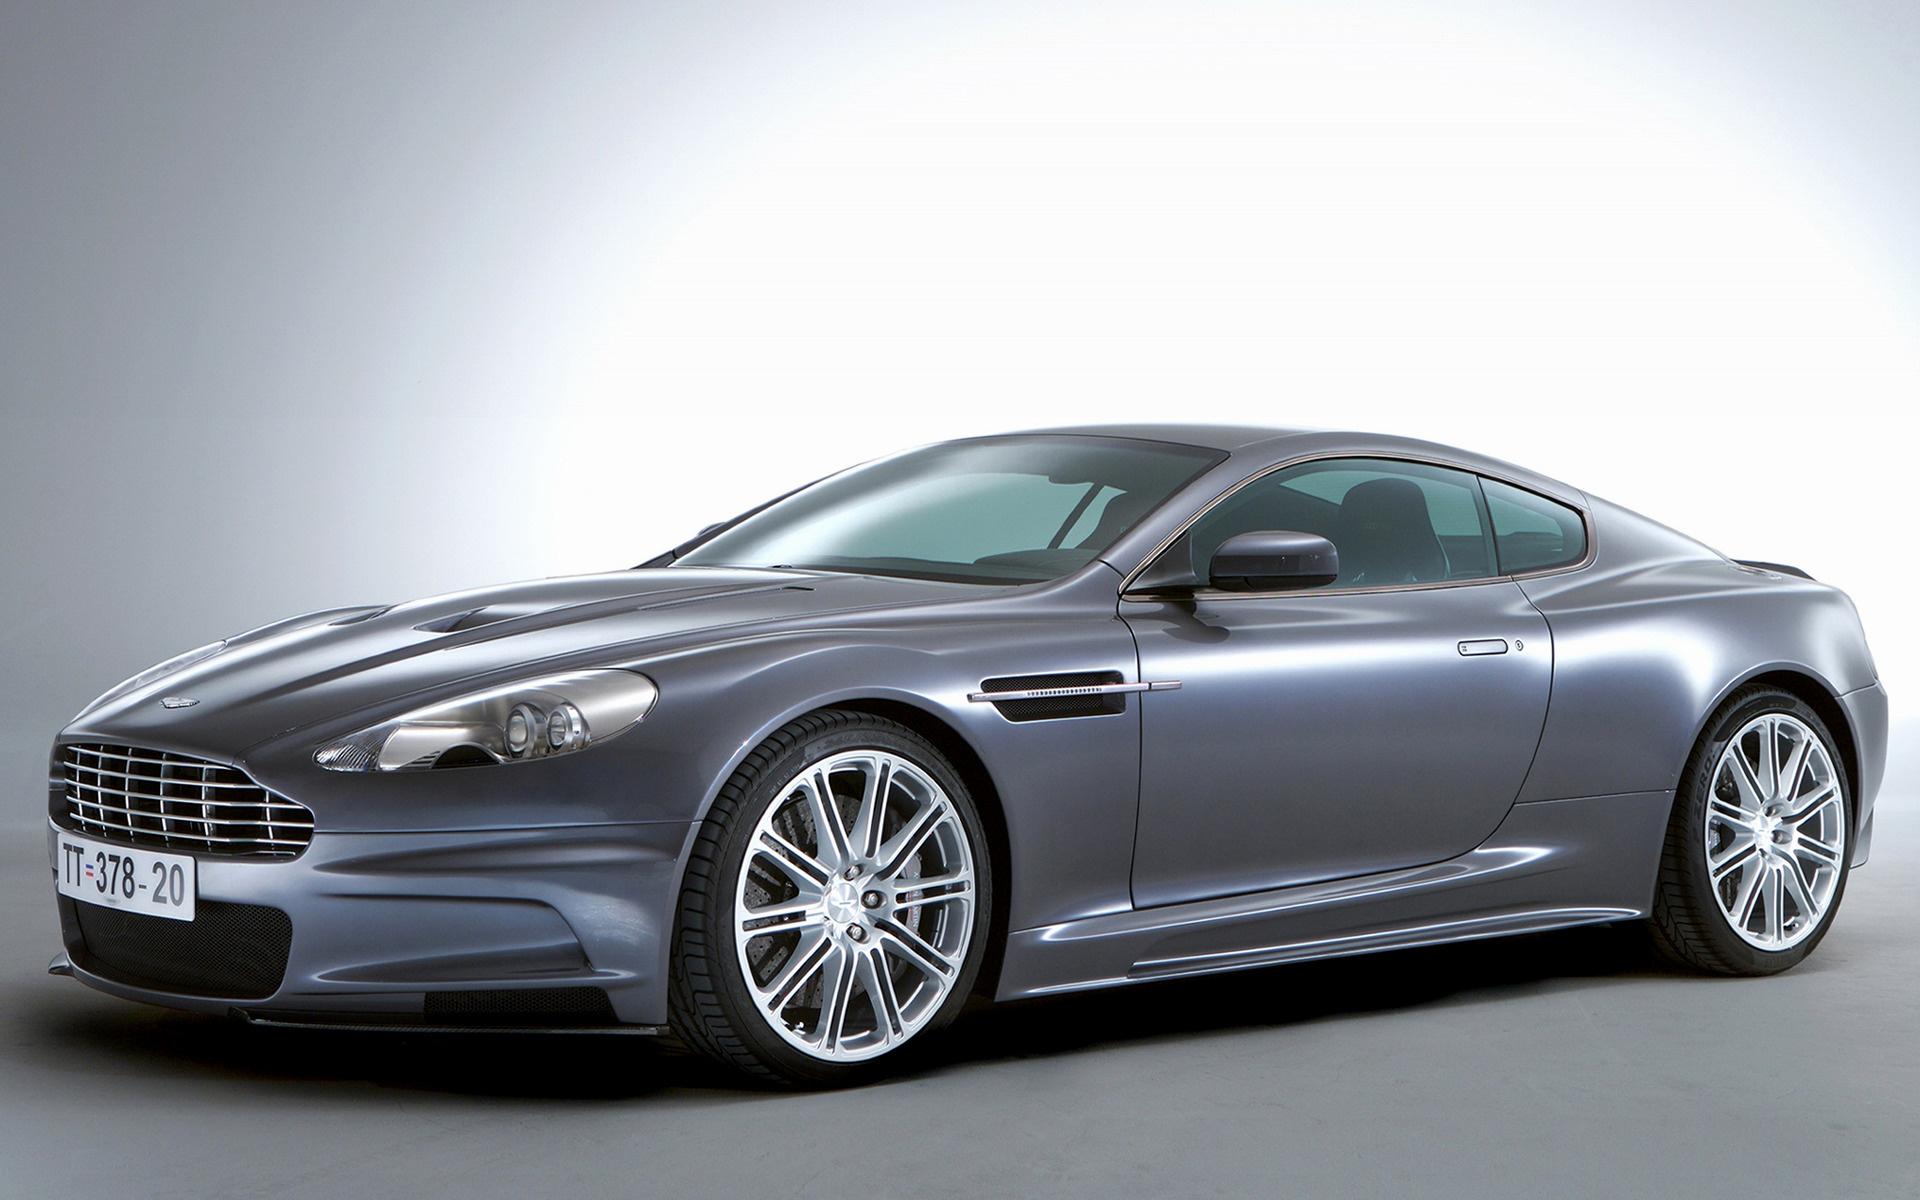 Casino Royale Aston Martin